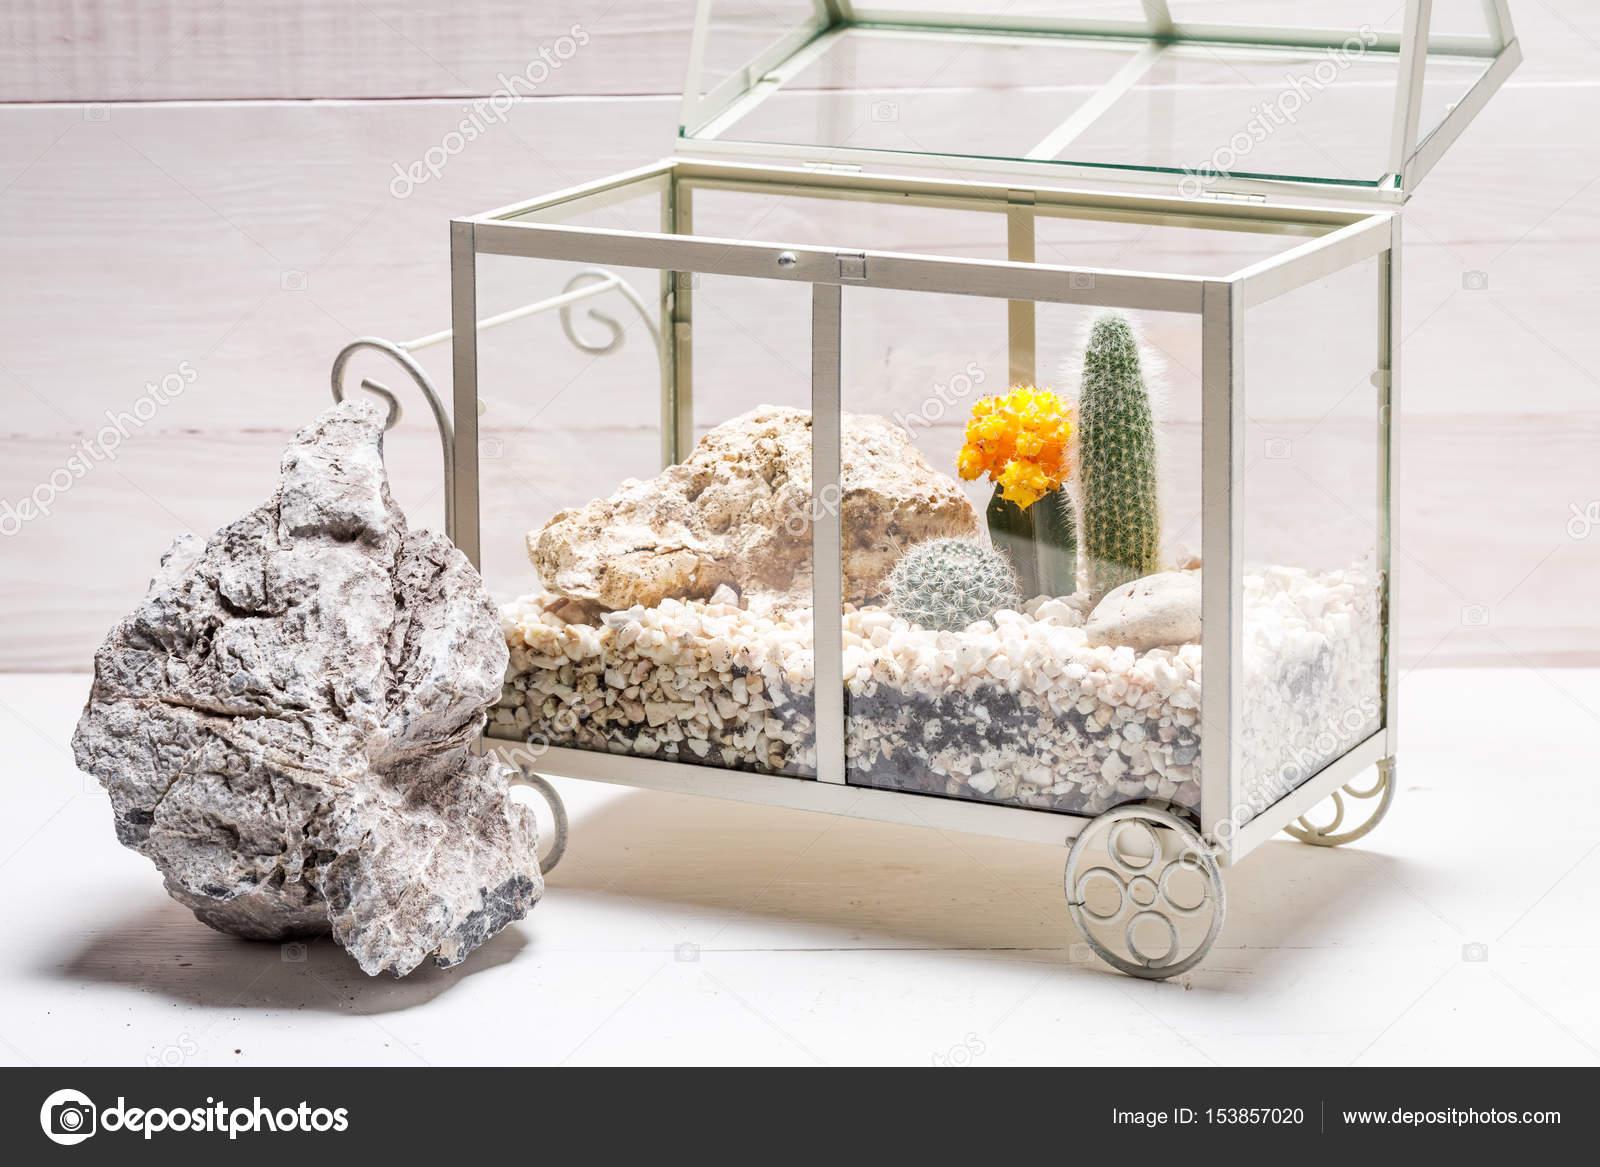 Wonderful Terrarium With Cactus And Piece Of Desert Stock Photo C Shaiith79 153857020